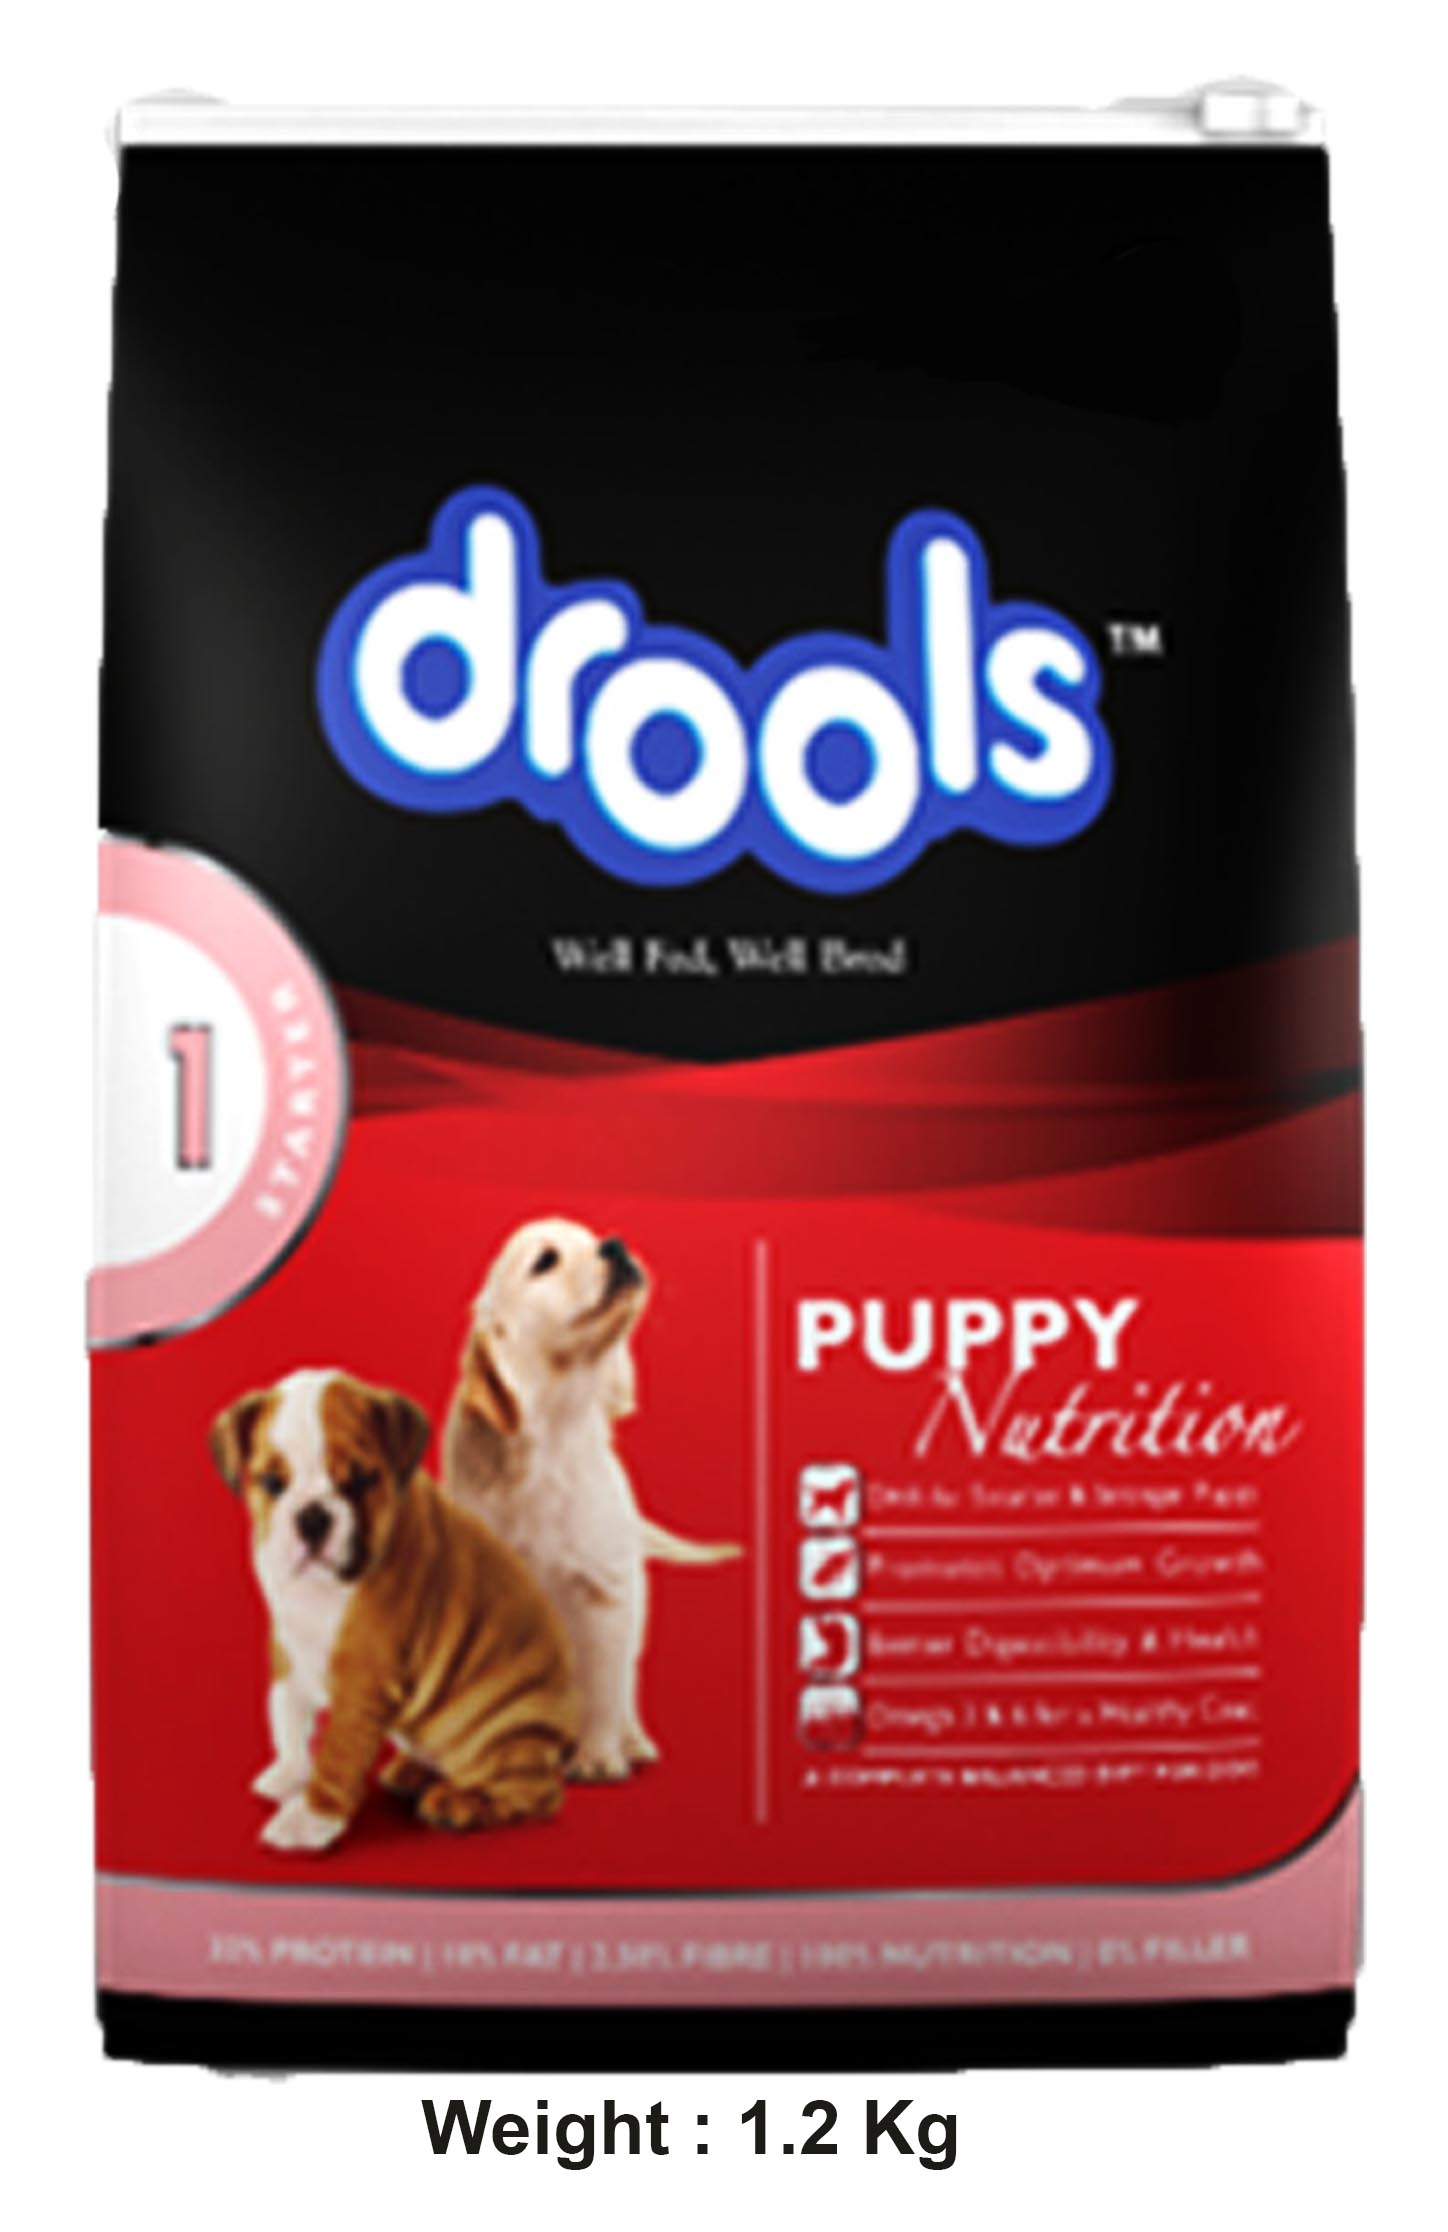 Drools Puppy Food 100% Vegetarian 3kg - Dog - buy at ...